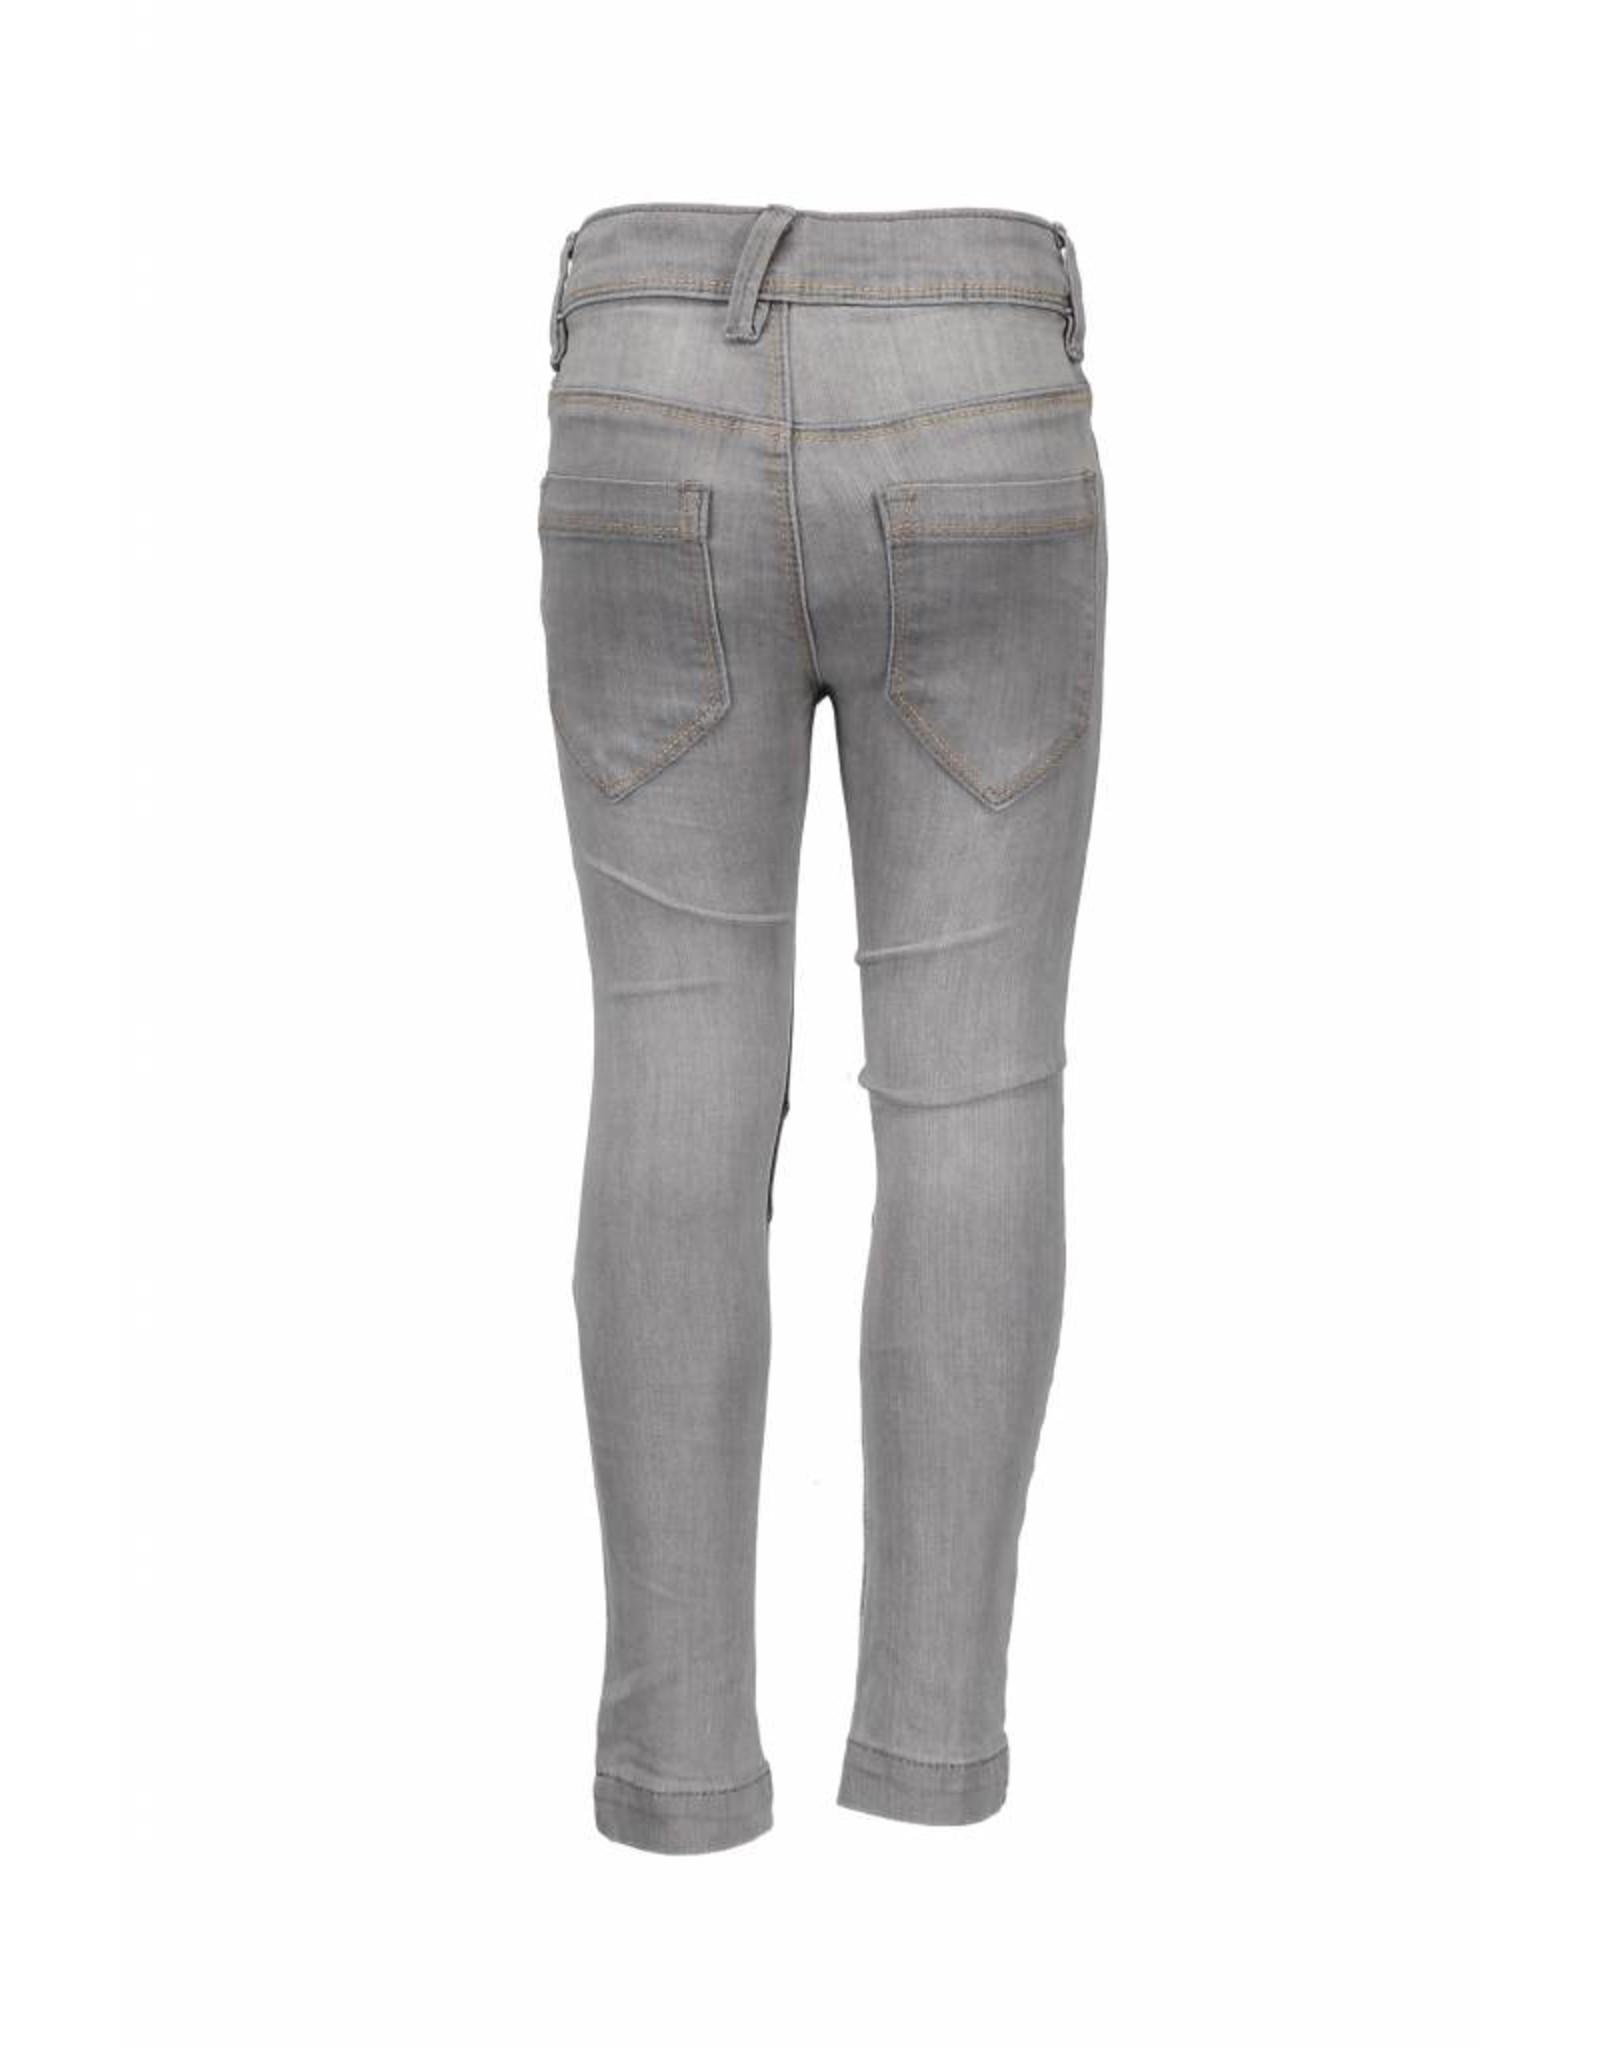 Moodstreet Darlin Moodstreet Darlin Jeans Washed Denim